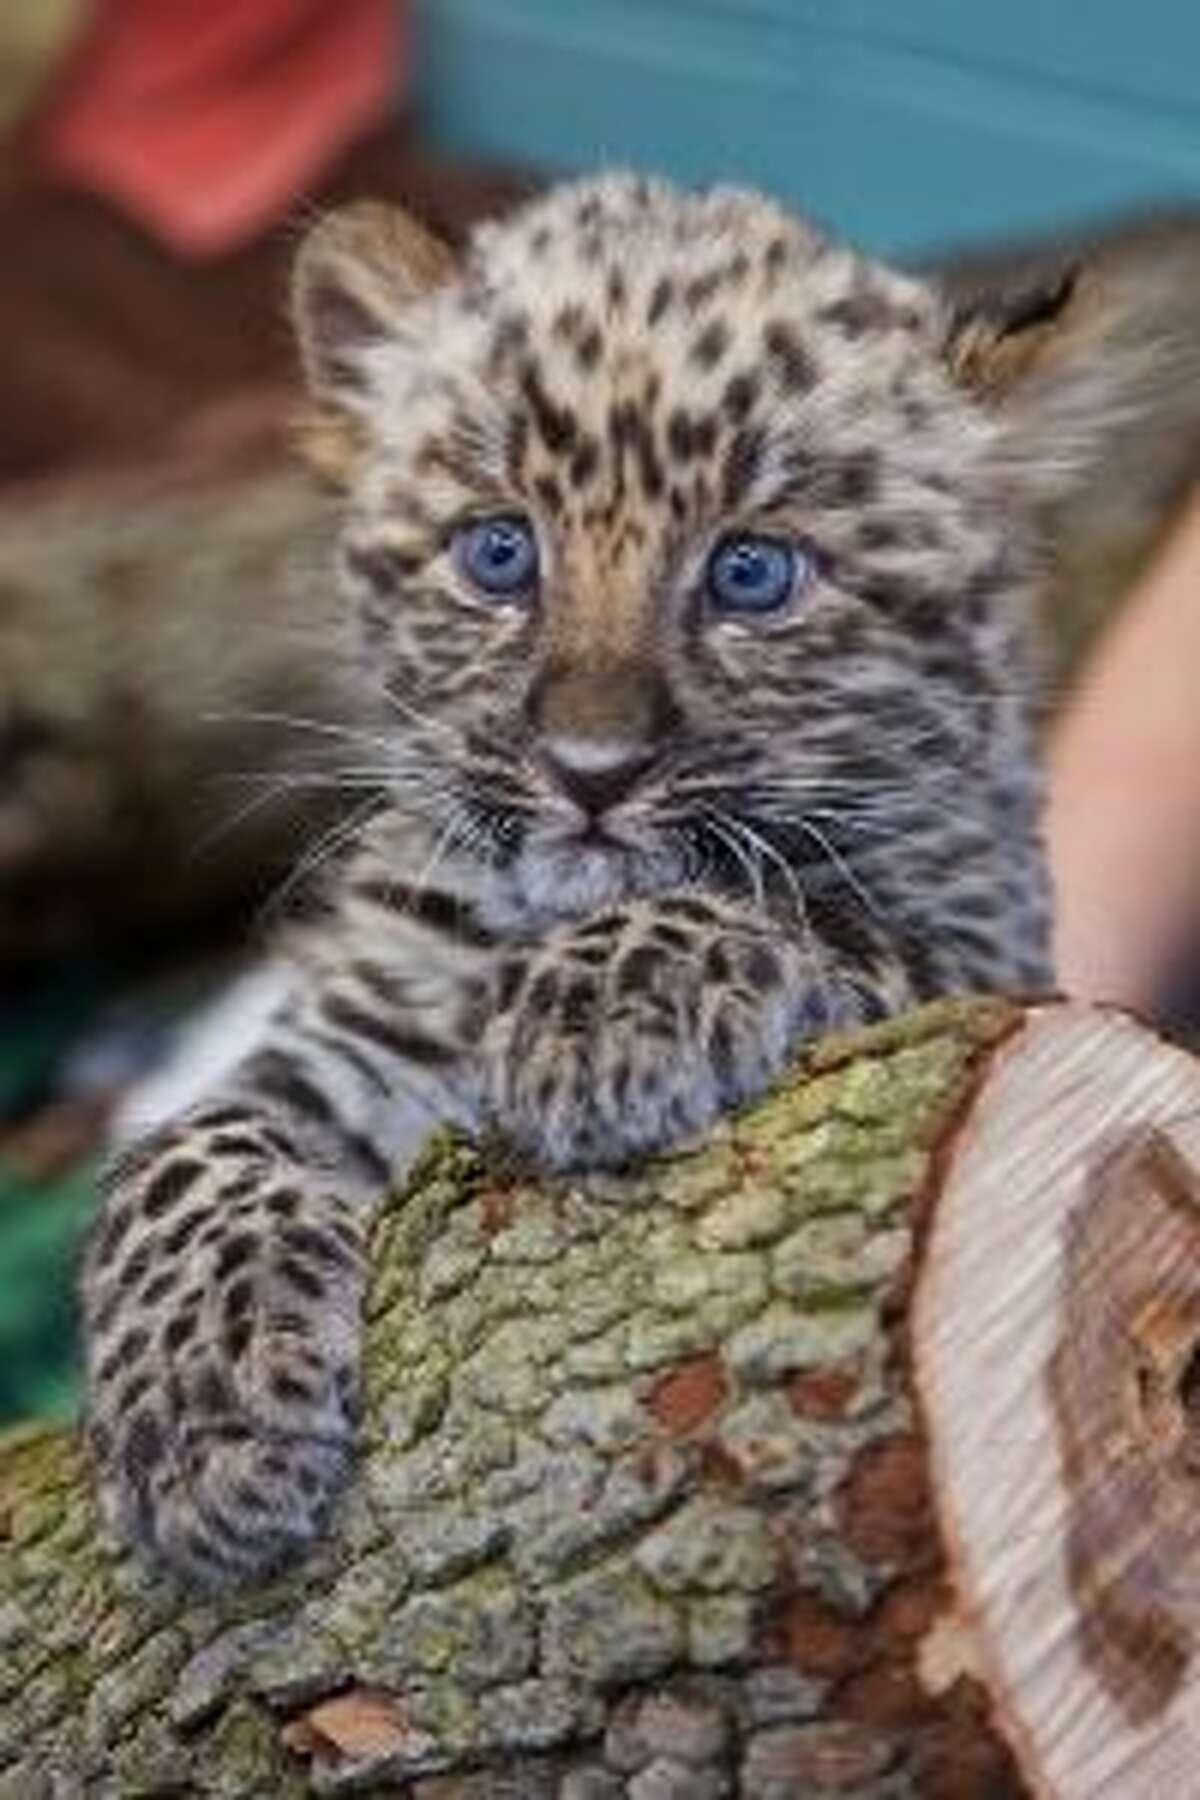 Orion is a Amur leopard cub at the Beardsley Zoo.- Shannon Calvert